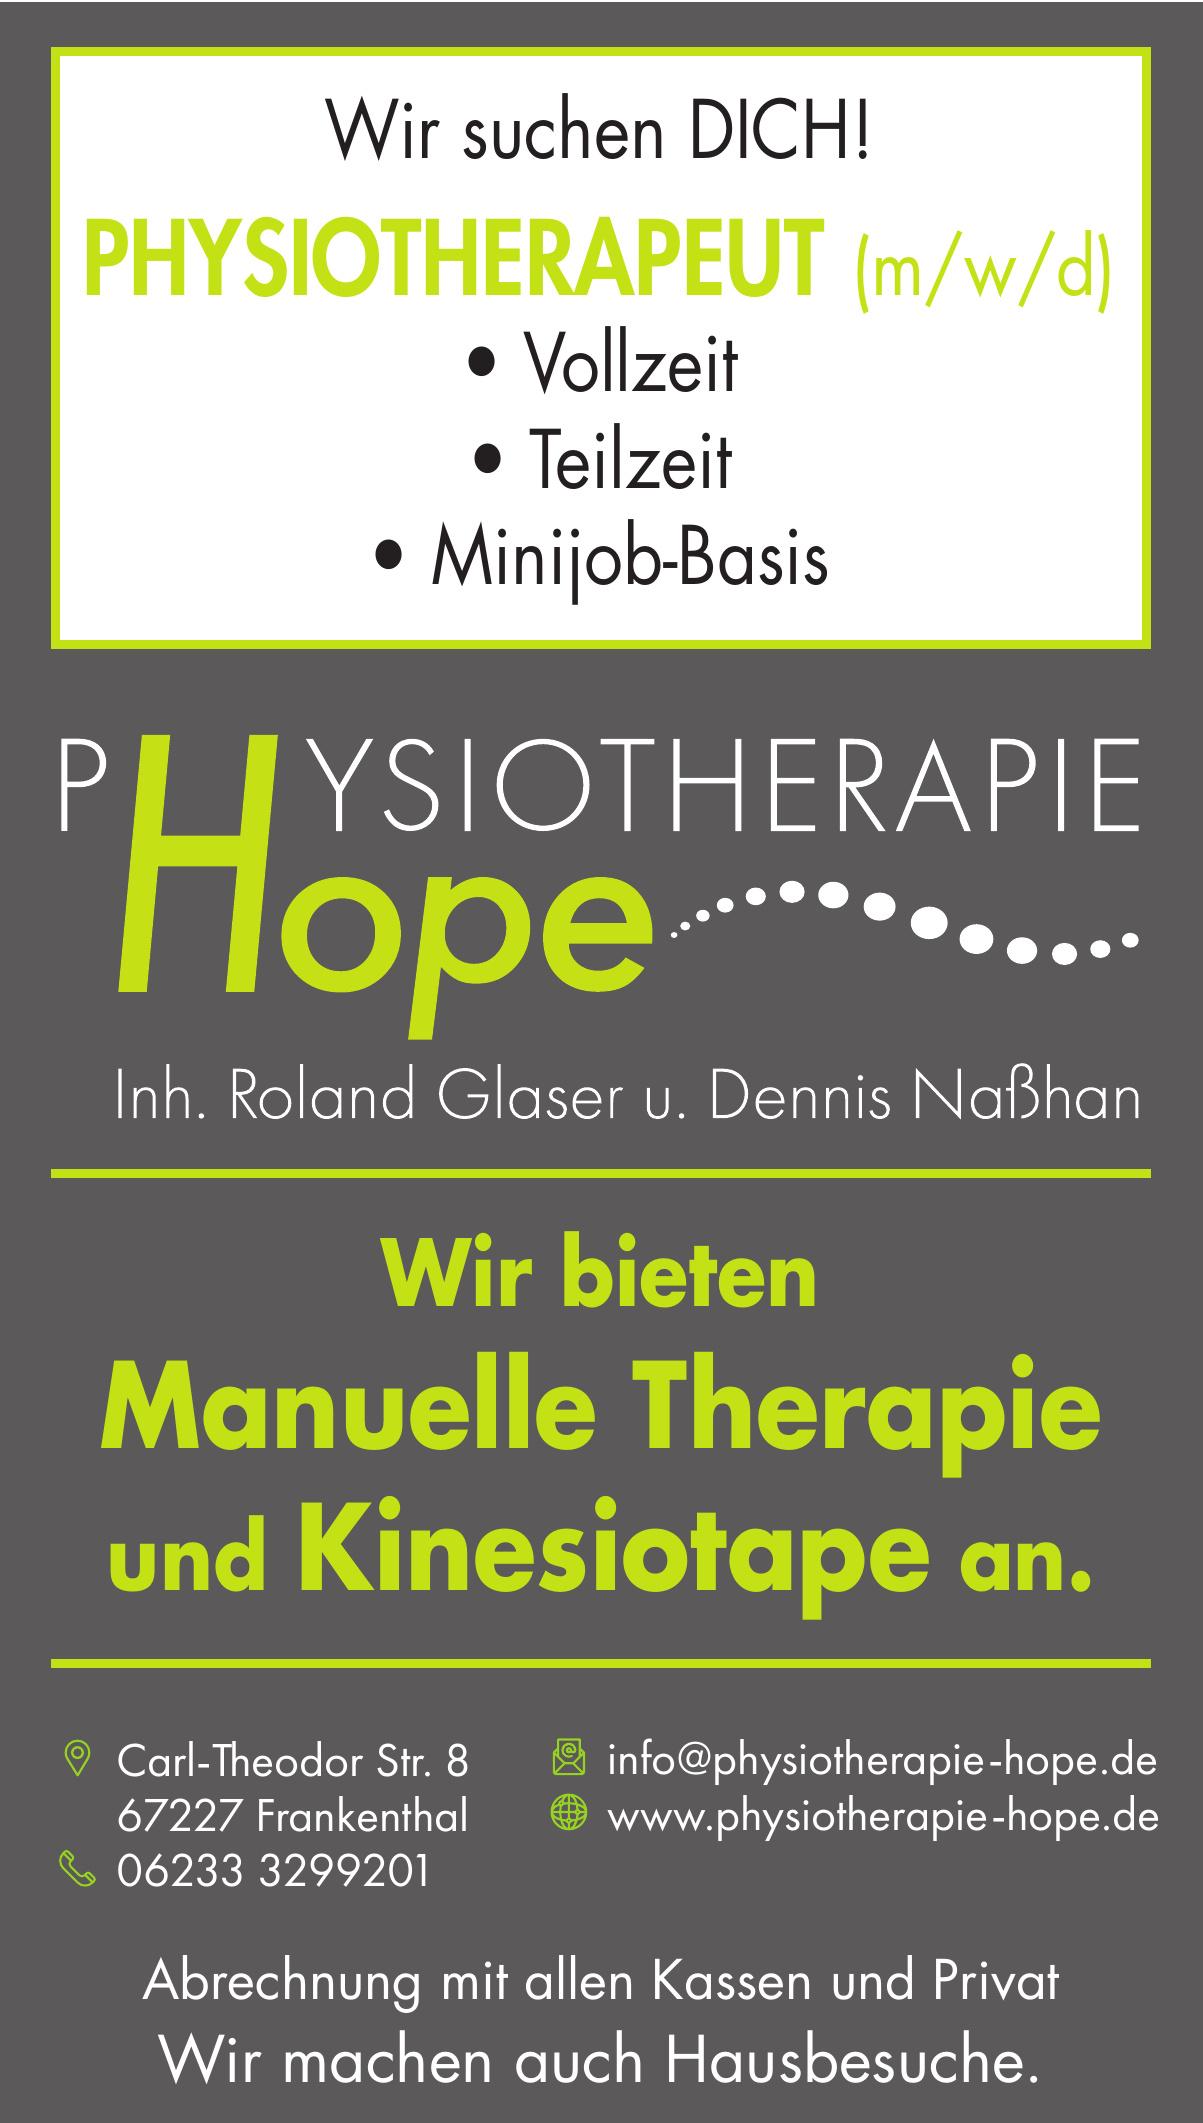 Physiotherapie Hope GbR